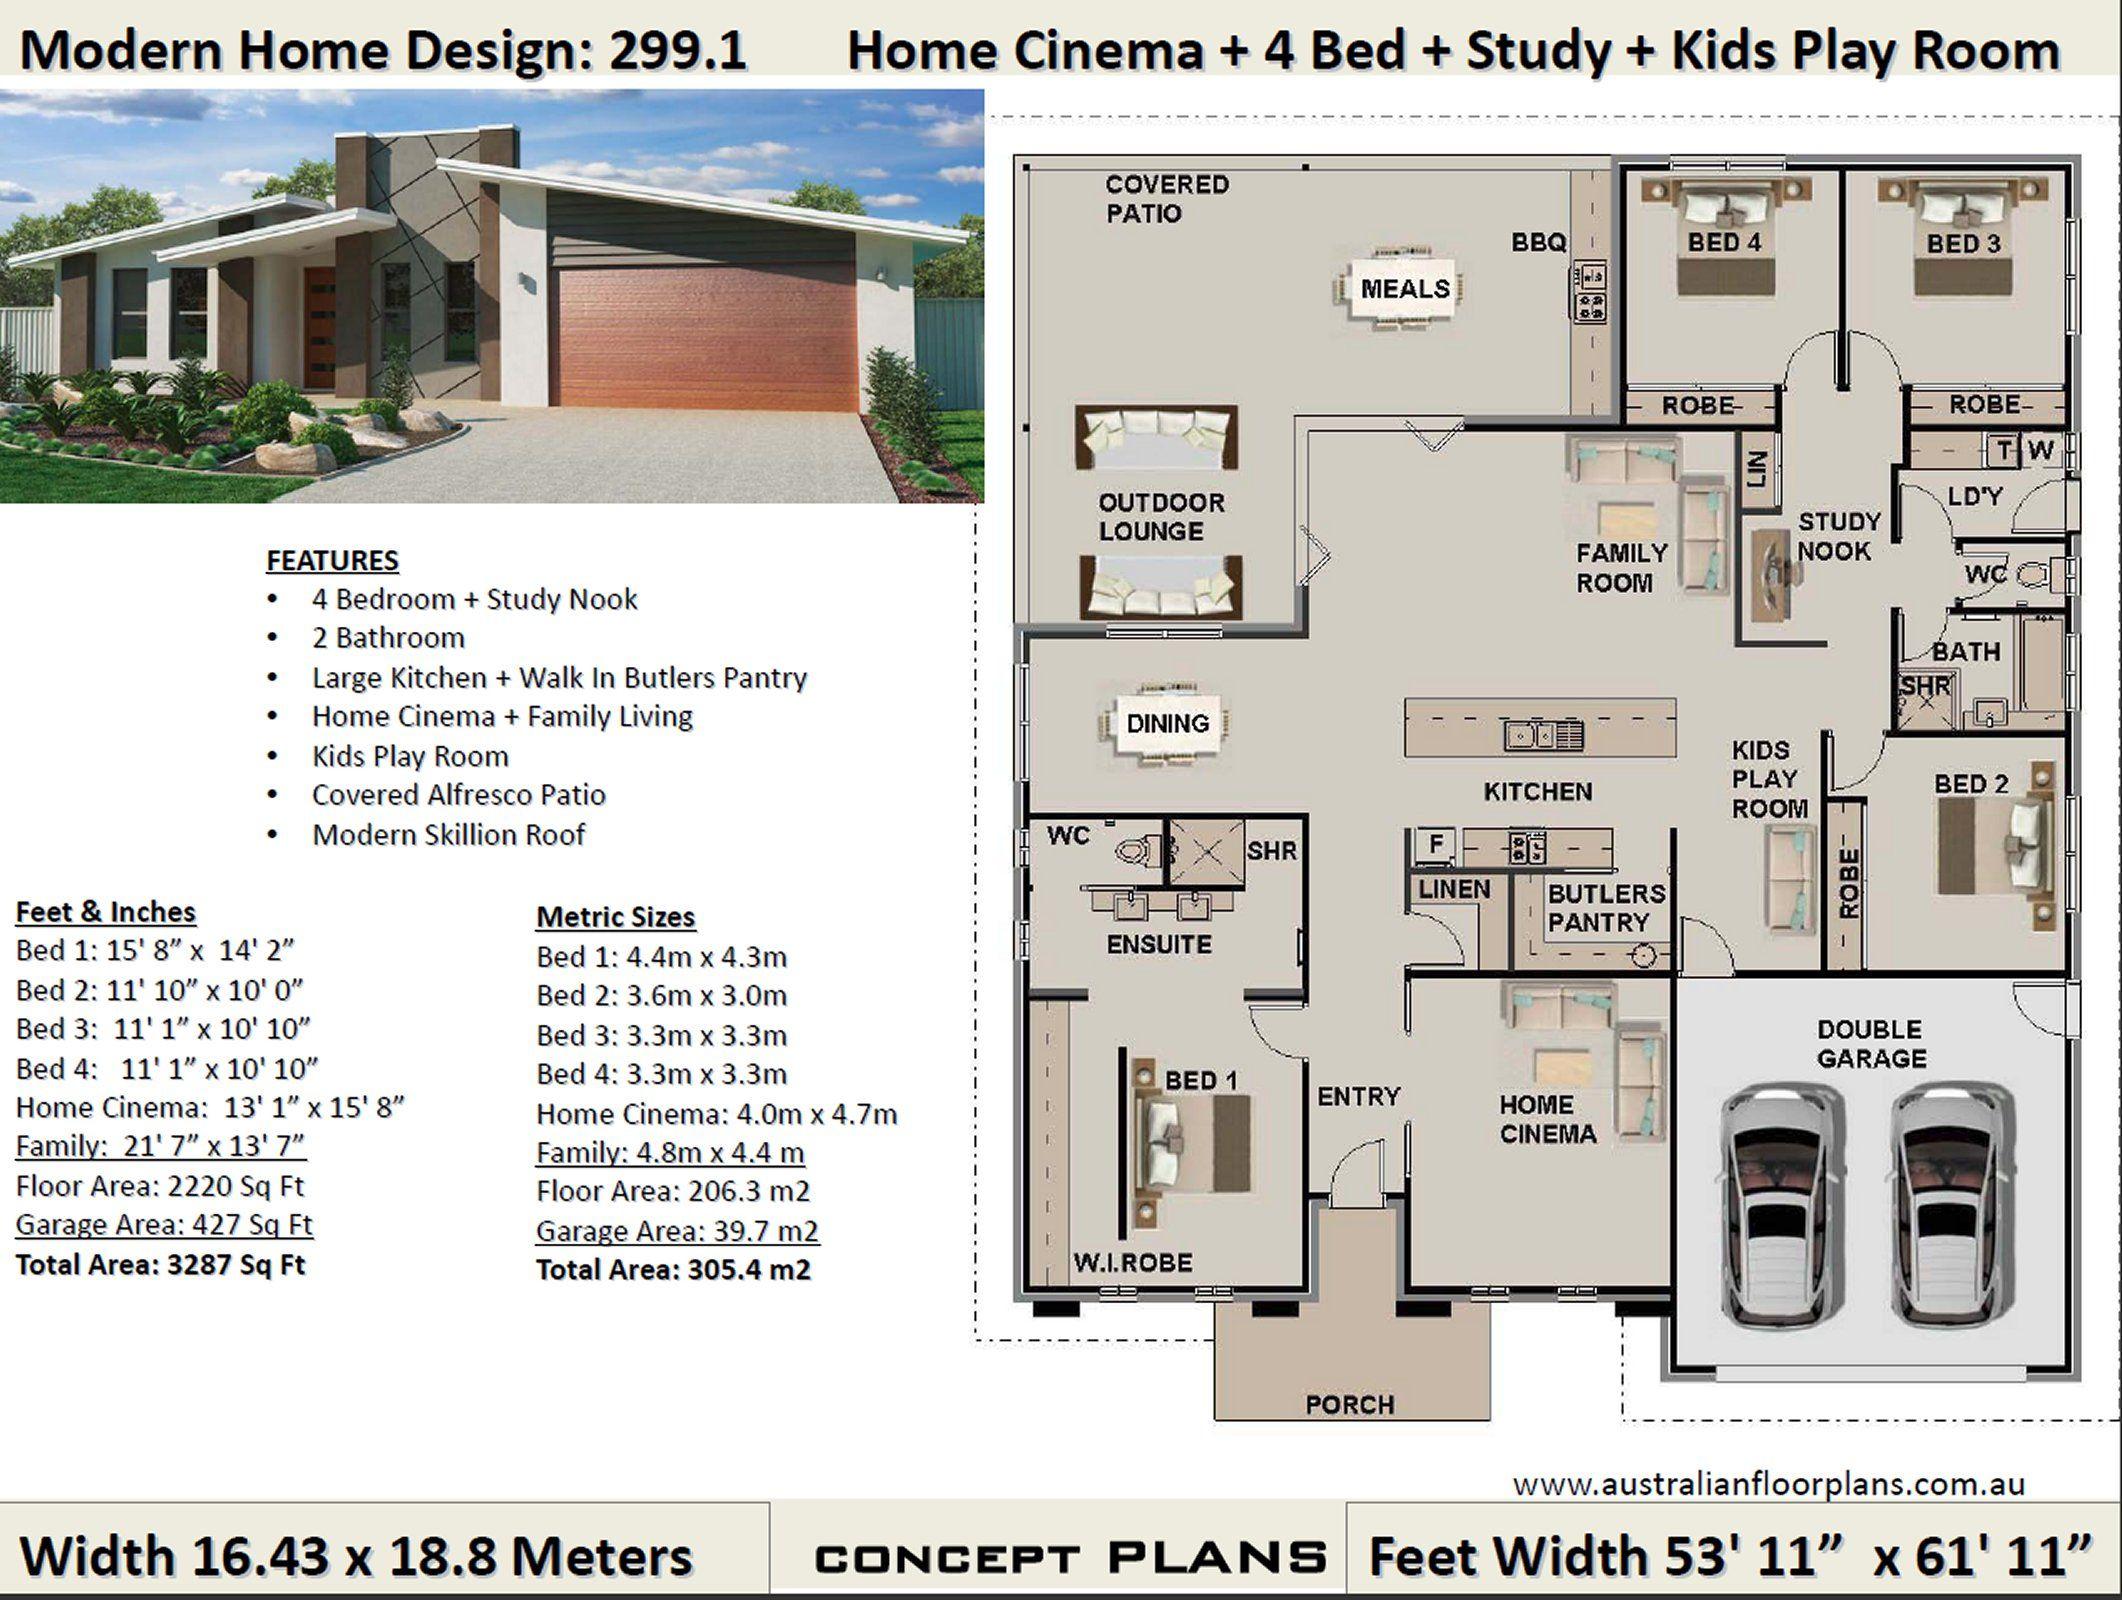 Modern Skillion Roof 4 Bedroom House Plans 299 1 Concept House Plan Set Bedroom House Plans 4 Bedroom House Plans House Plans